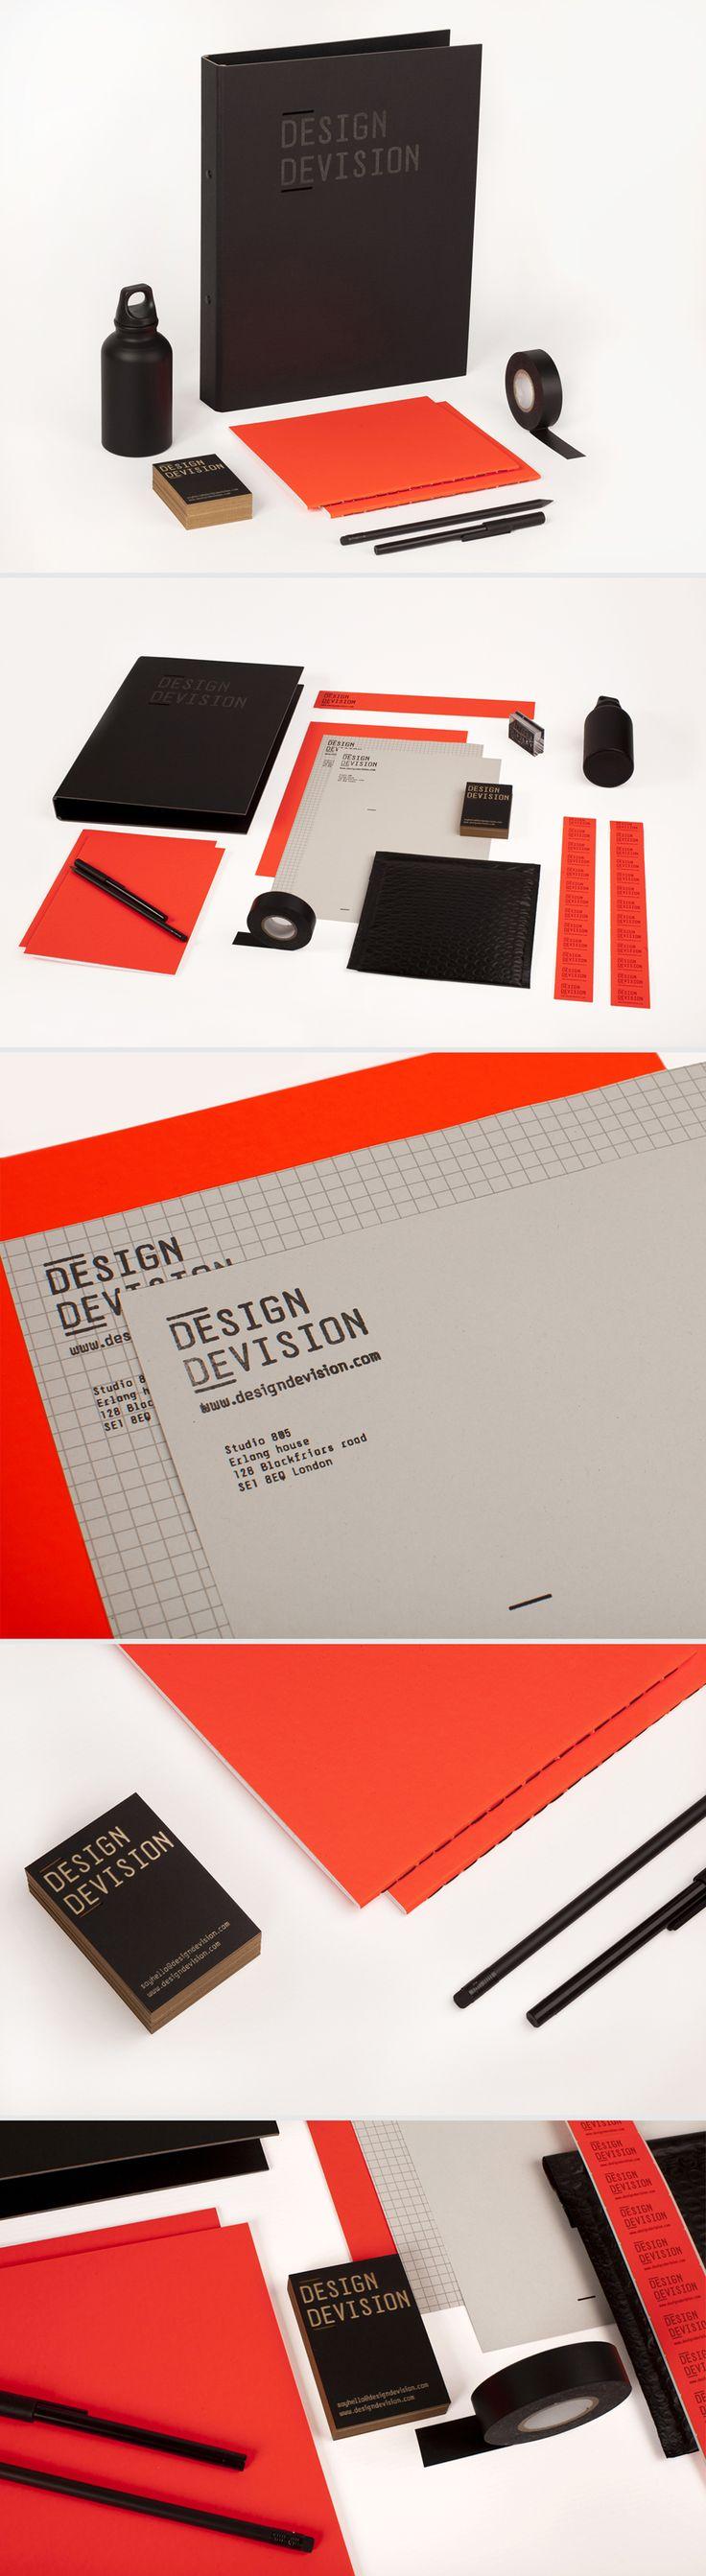 Design Devision Stationary, Identity © Polina Pakhomova